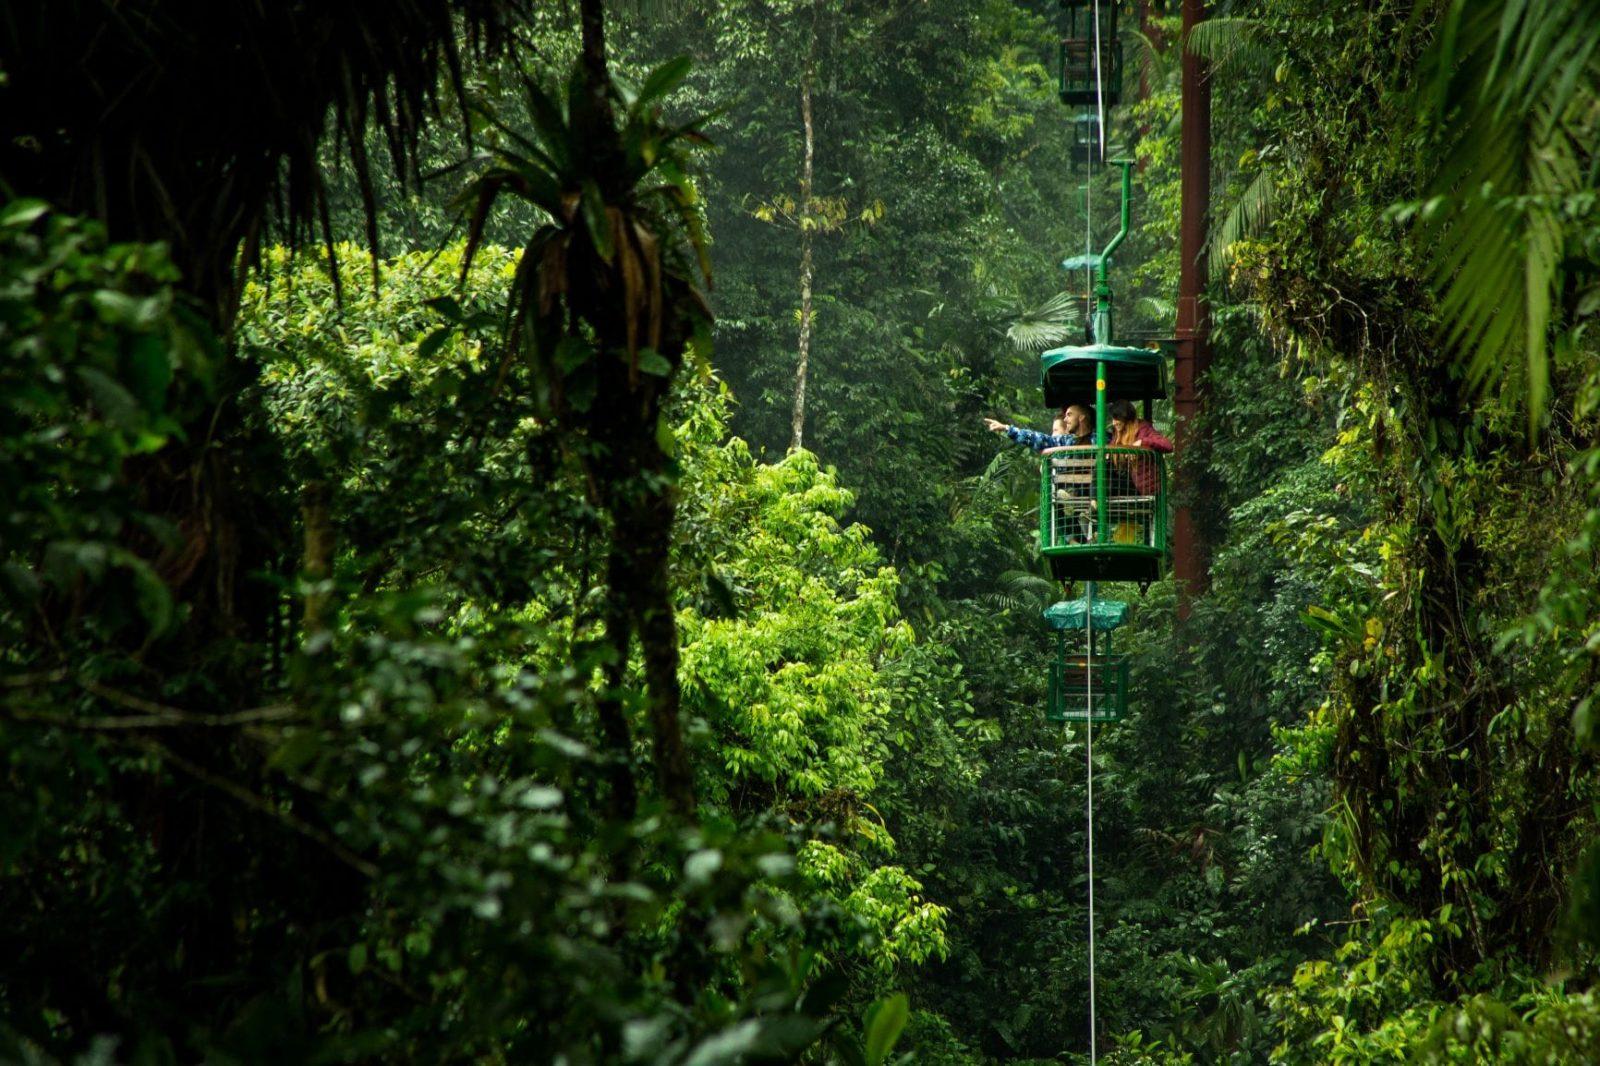 costa-rica-aerial-gda-global-dmc-alliance-rainforest-beyond-travel-incentives-Tram2-min